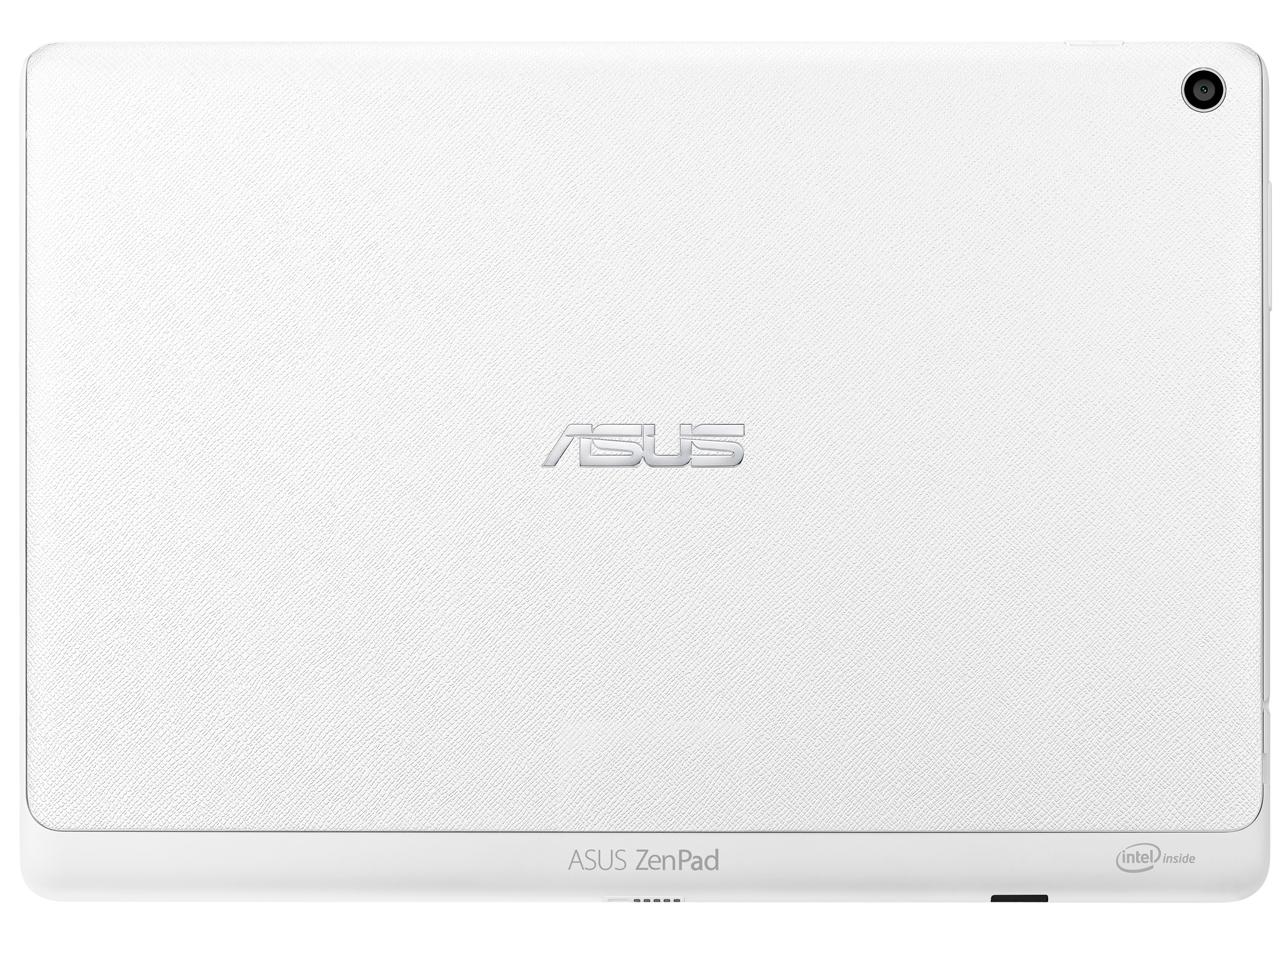 �w�{�� �w�ʁx ASUS ZenPad 10 Z300C-WH16 [�z���C�g] �̐��i�摜